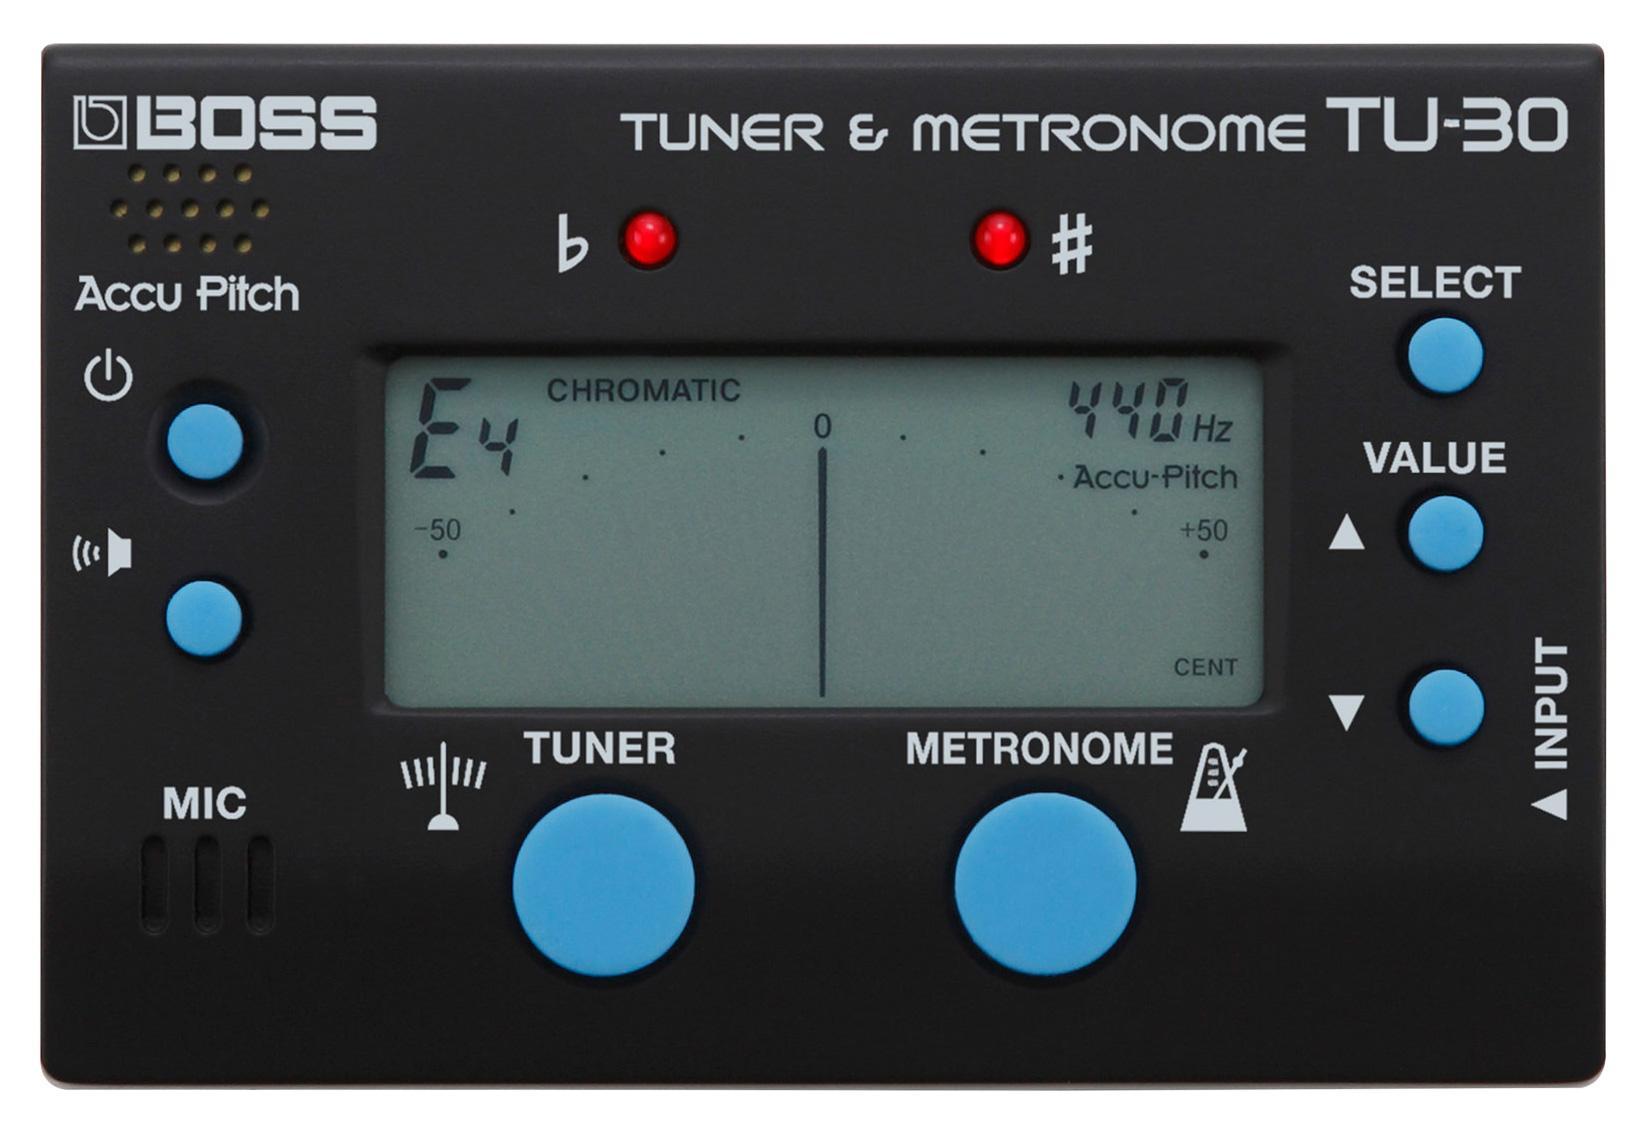 Musikerzubehoer - Boss TU 30 Tuner Metronome - Onlineshop Musikhaus Kirstein